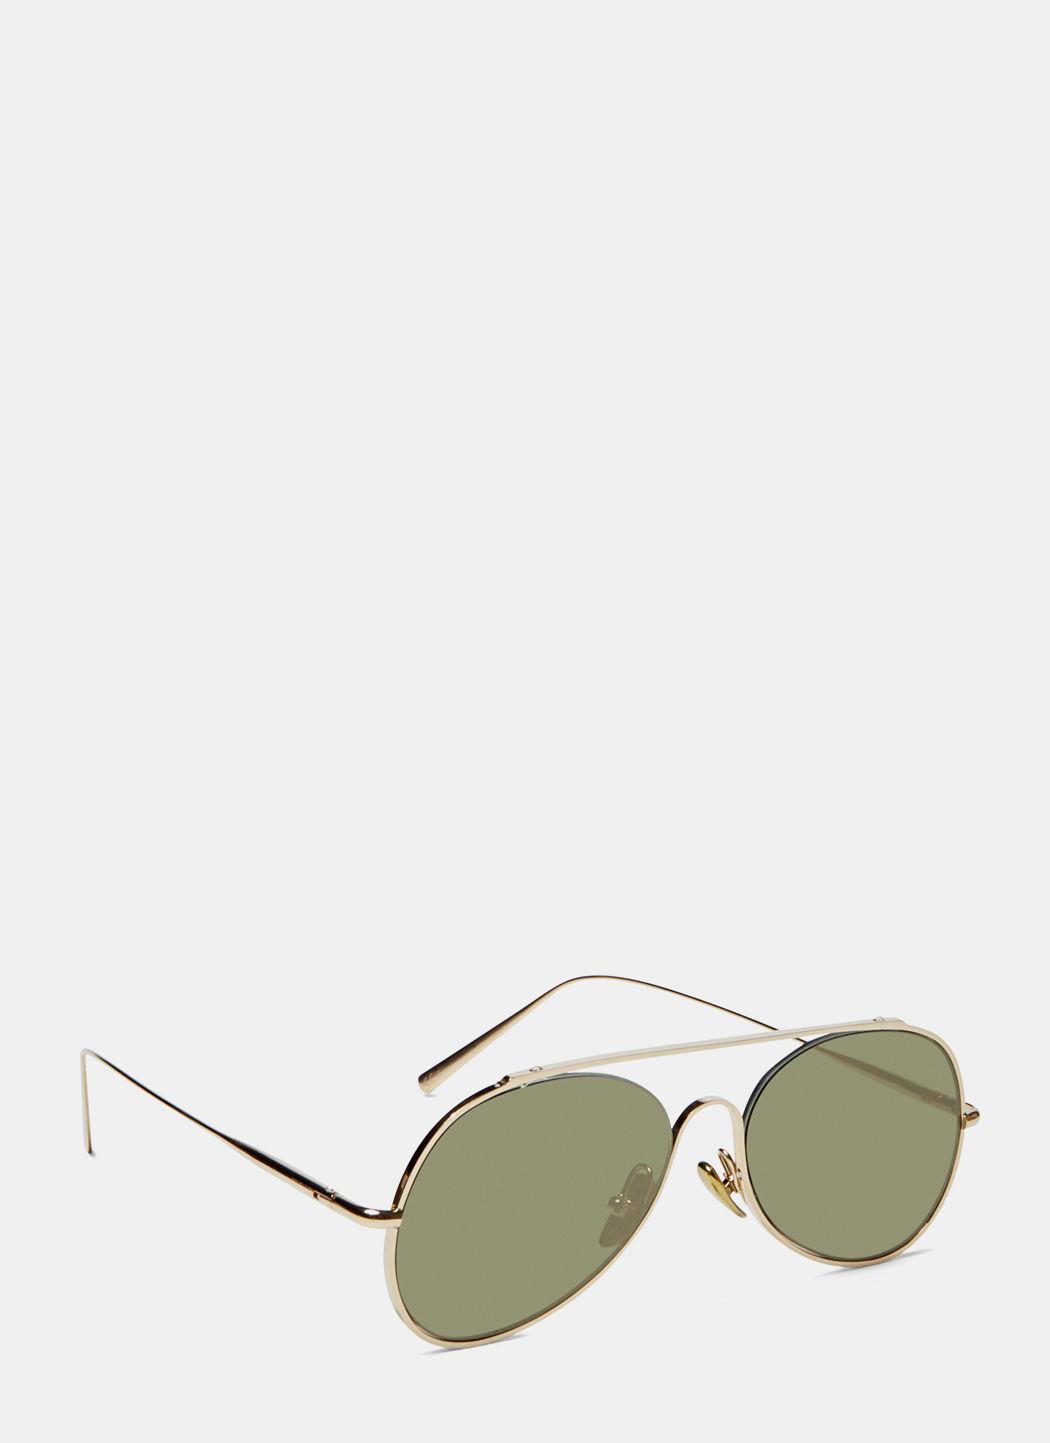 ACNE STUDIOS Unisex Small Spitfire Sunglasses In Gold